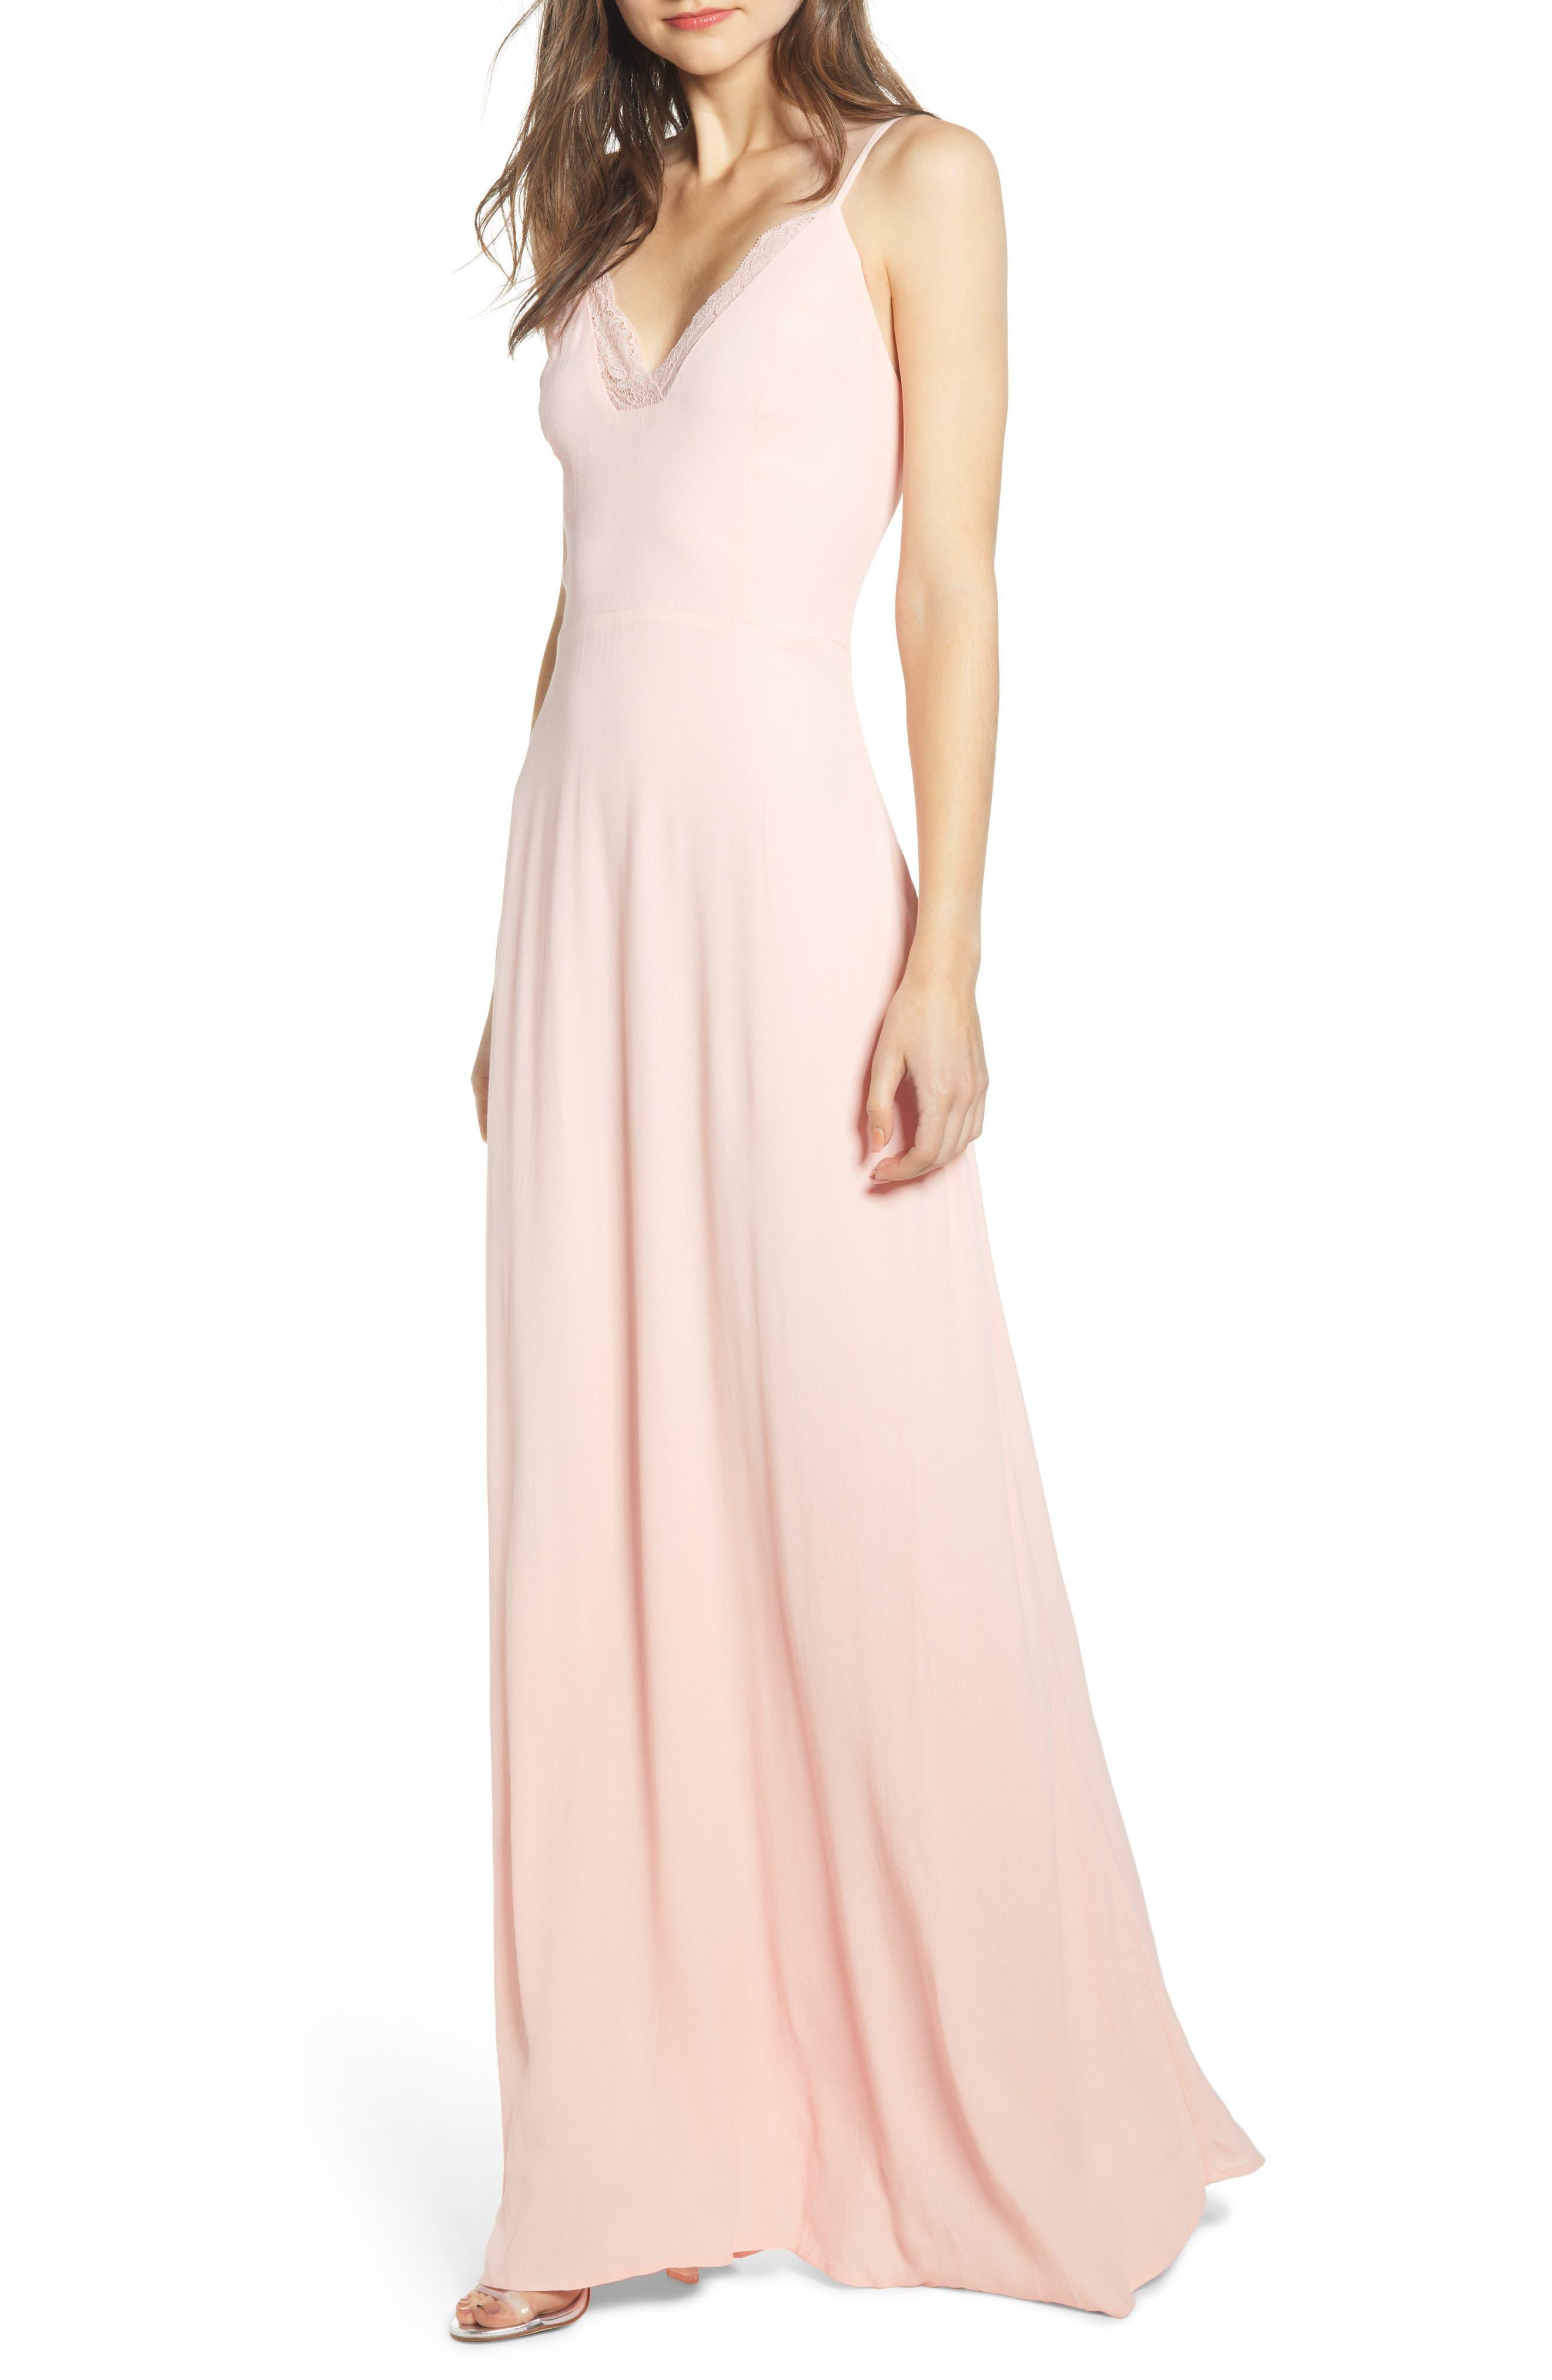 Leith Lace Trim Maxi Dress, Pink